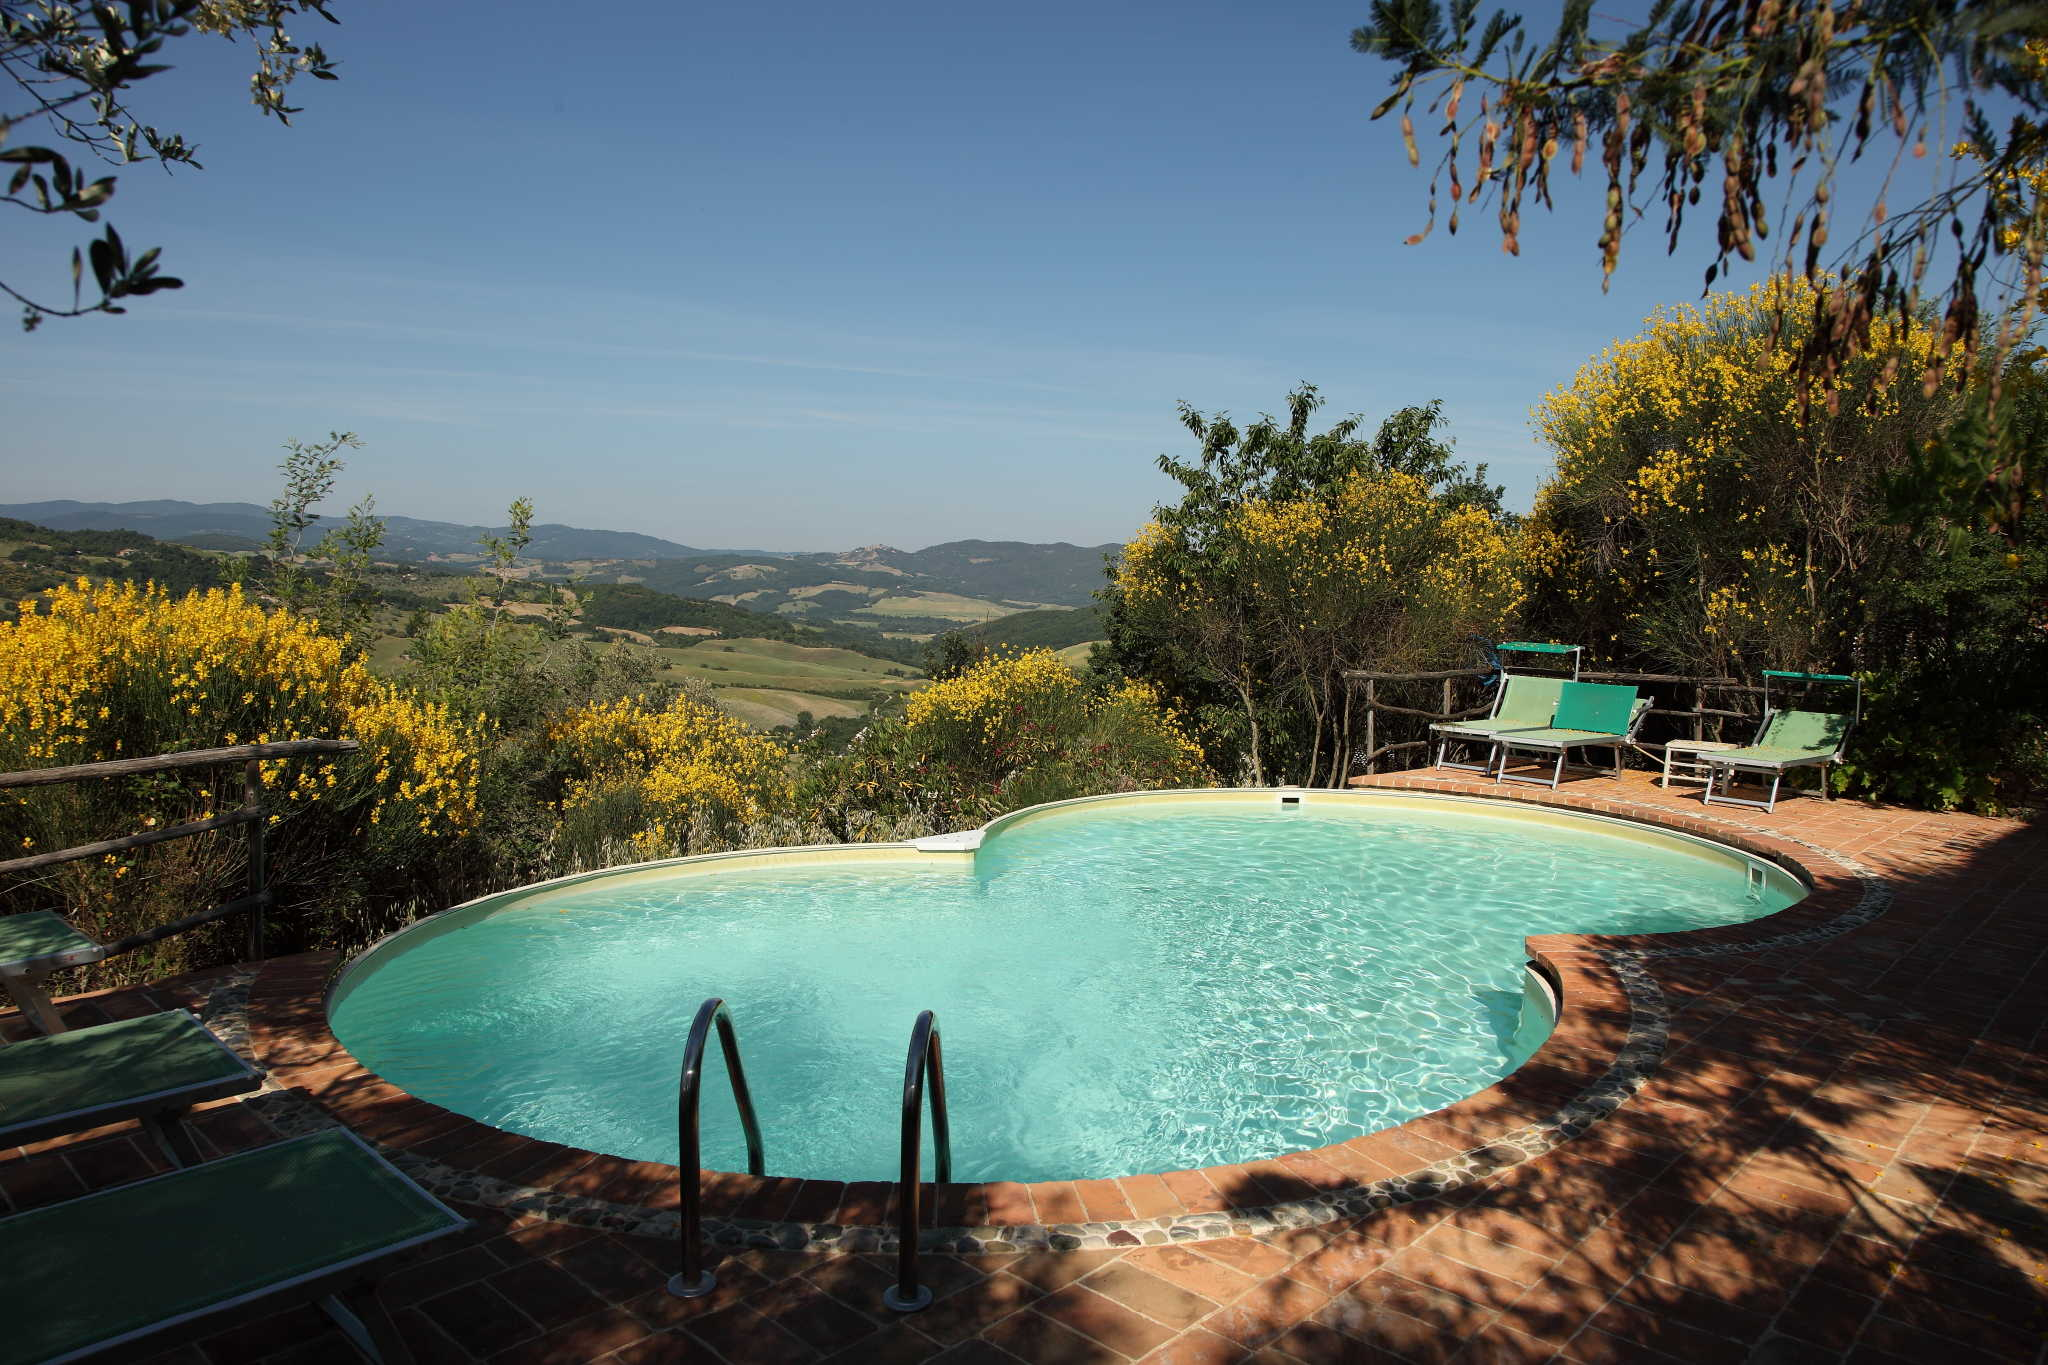 Panorama-Pool 8,55 x 5 m